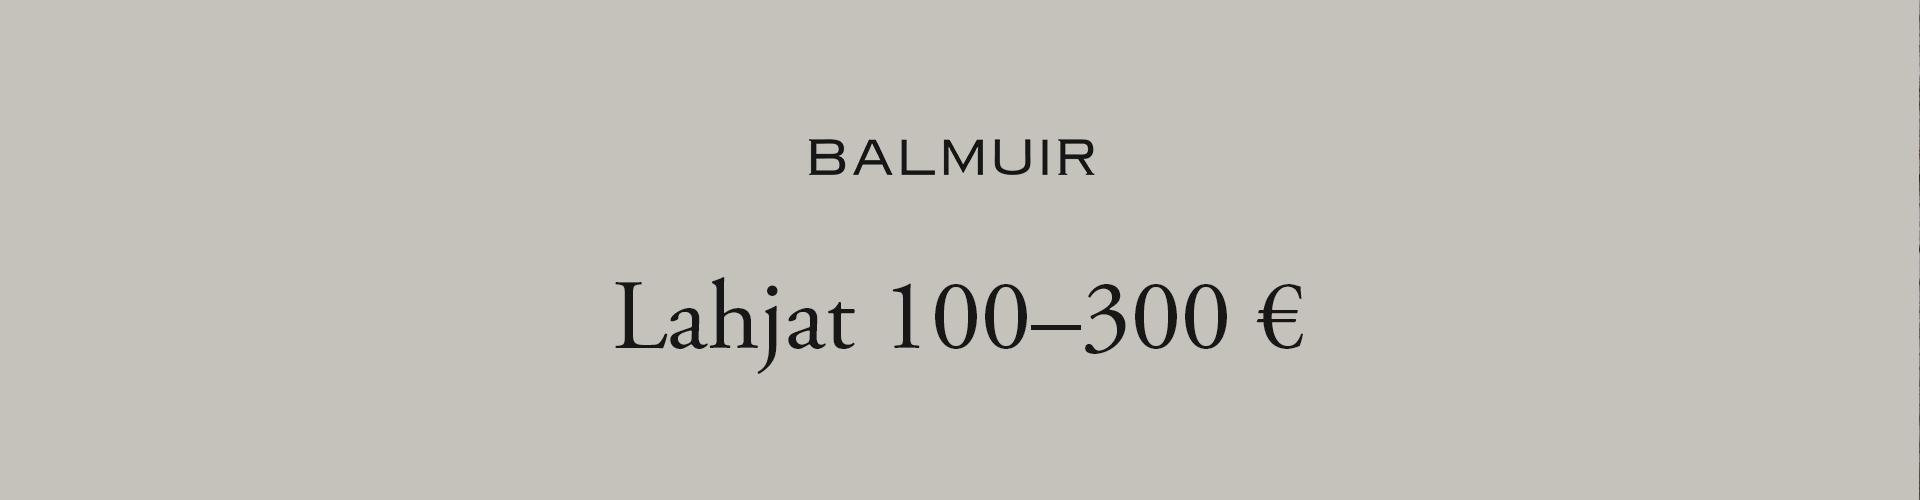 Lahjat 100-300 €